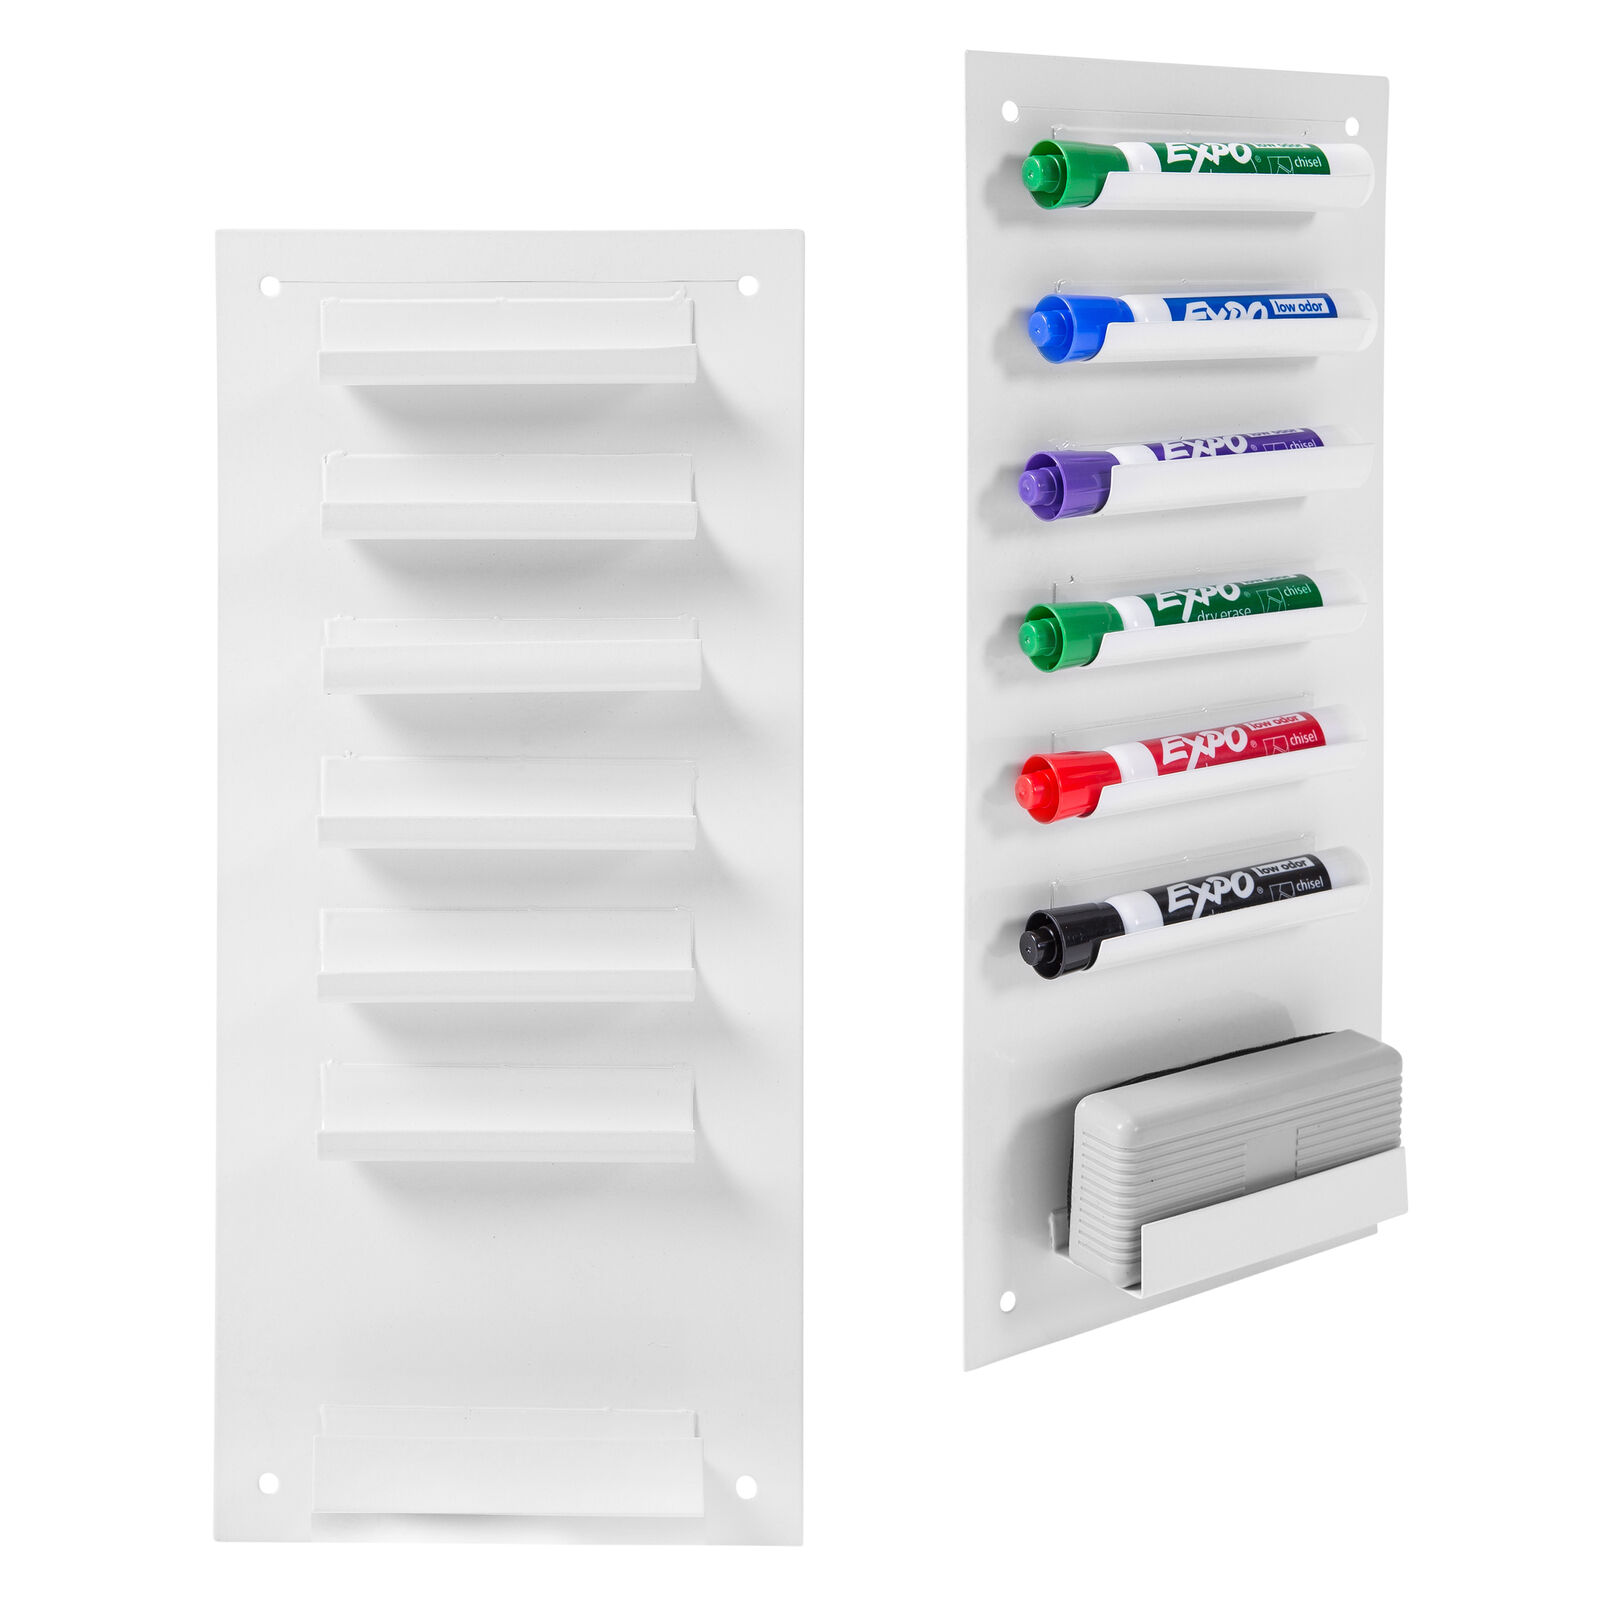 Set of 2 Wall Mountable Metal 5-Slot Dry Erase Whiteboard Marker /& Eraser Holder Tray Black